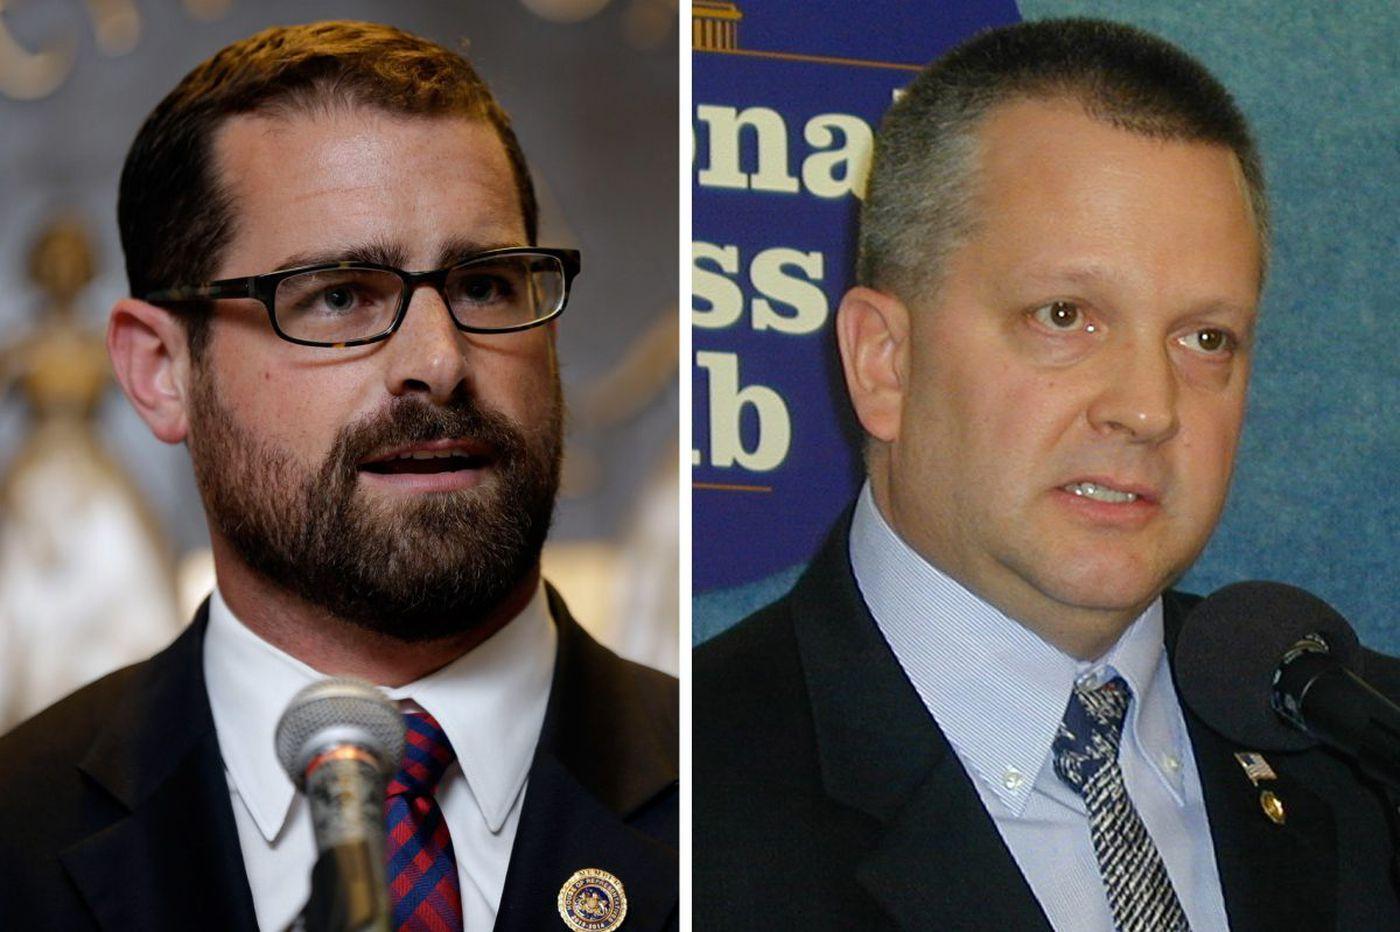 Pa. legislator says Philly's Brian Sims called me an 'ignorant, racist bigot'